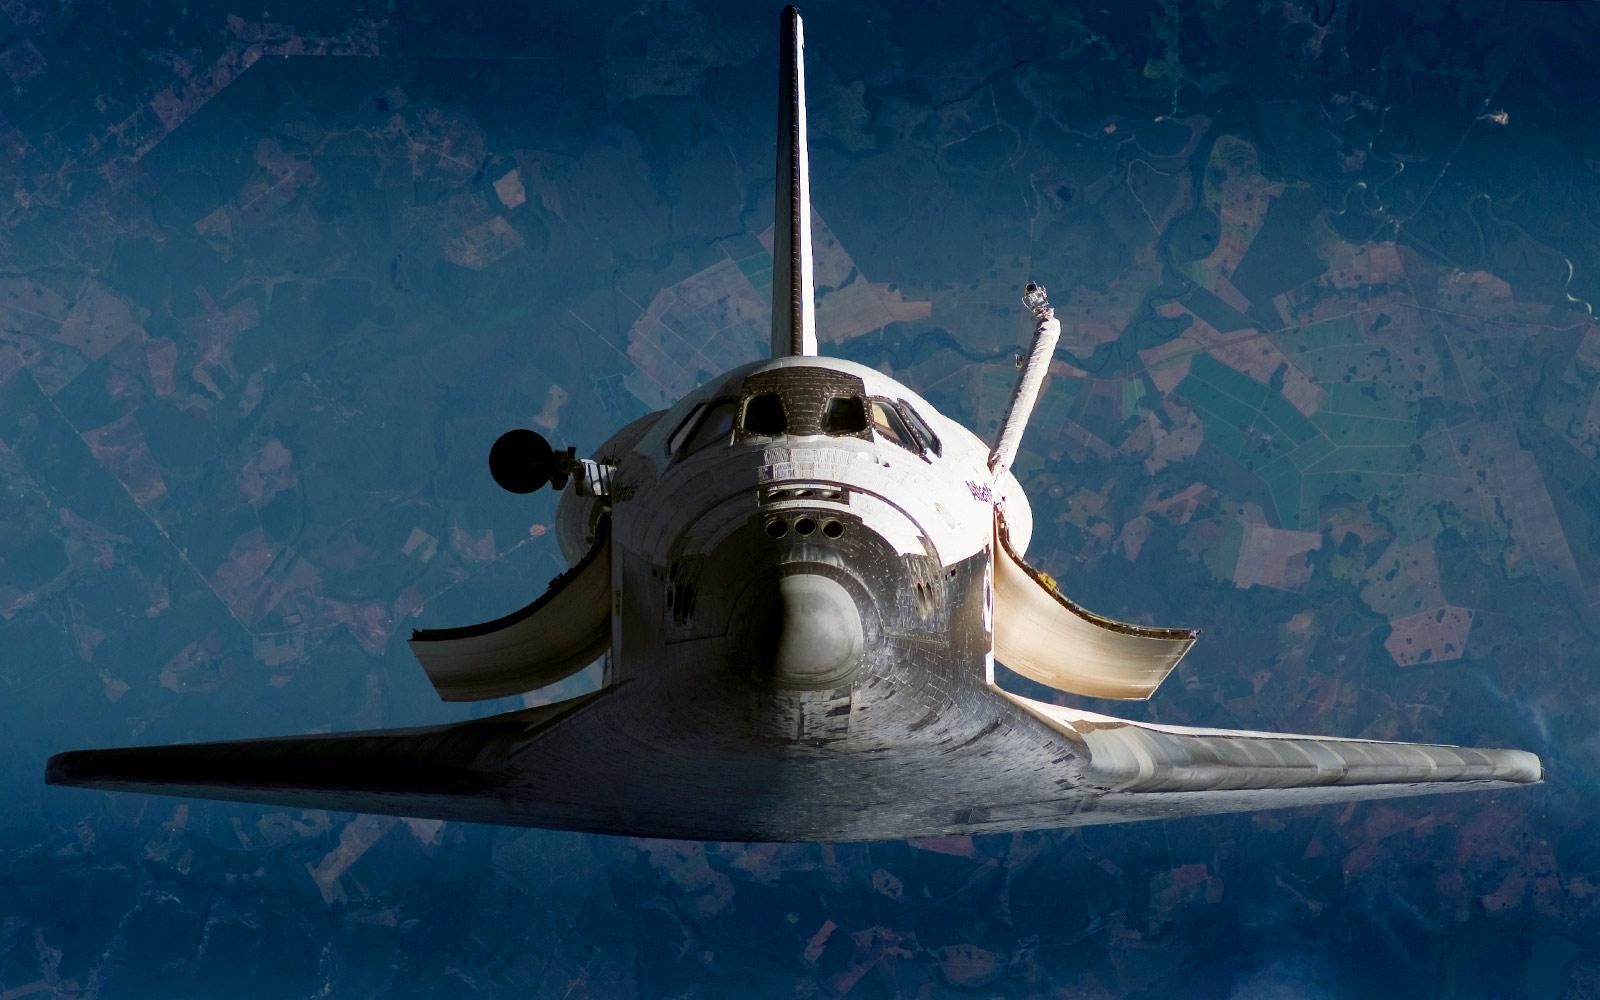 atlantis space shuttle di - photo #39